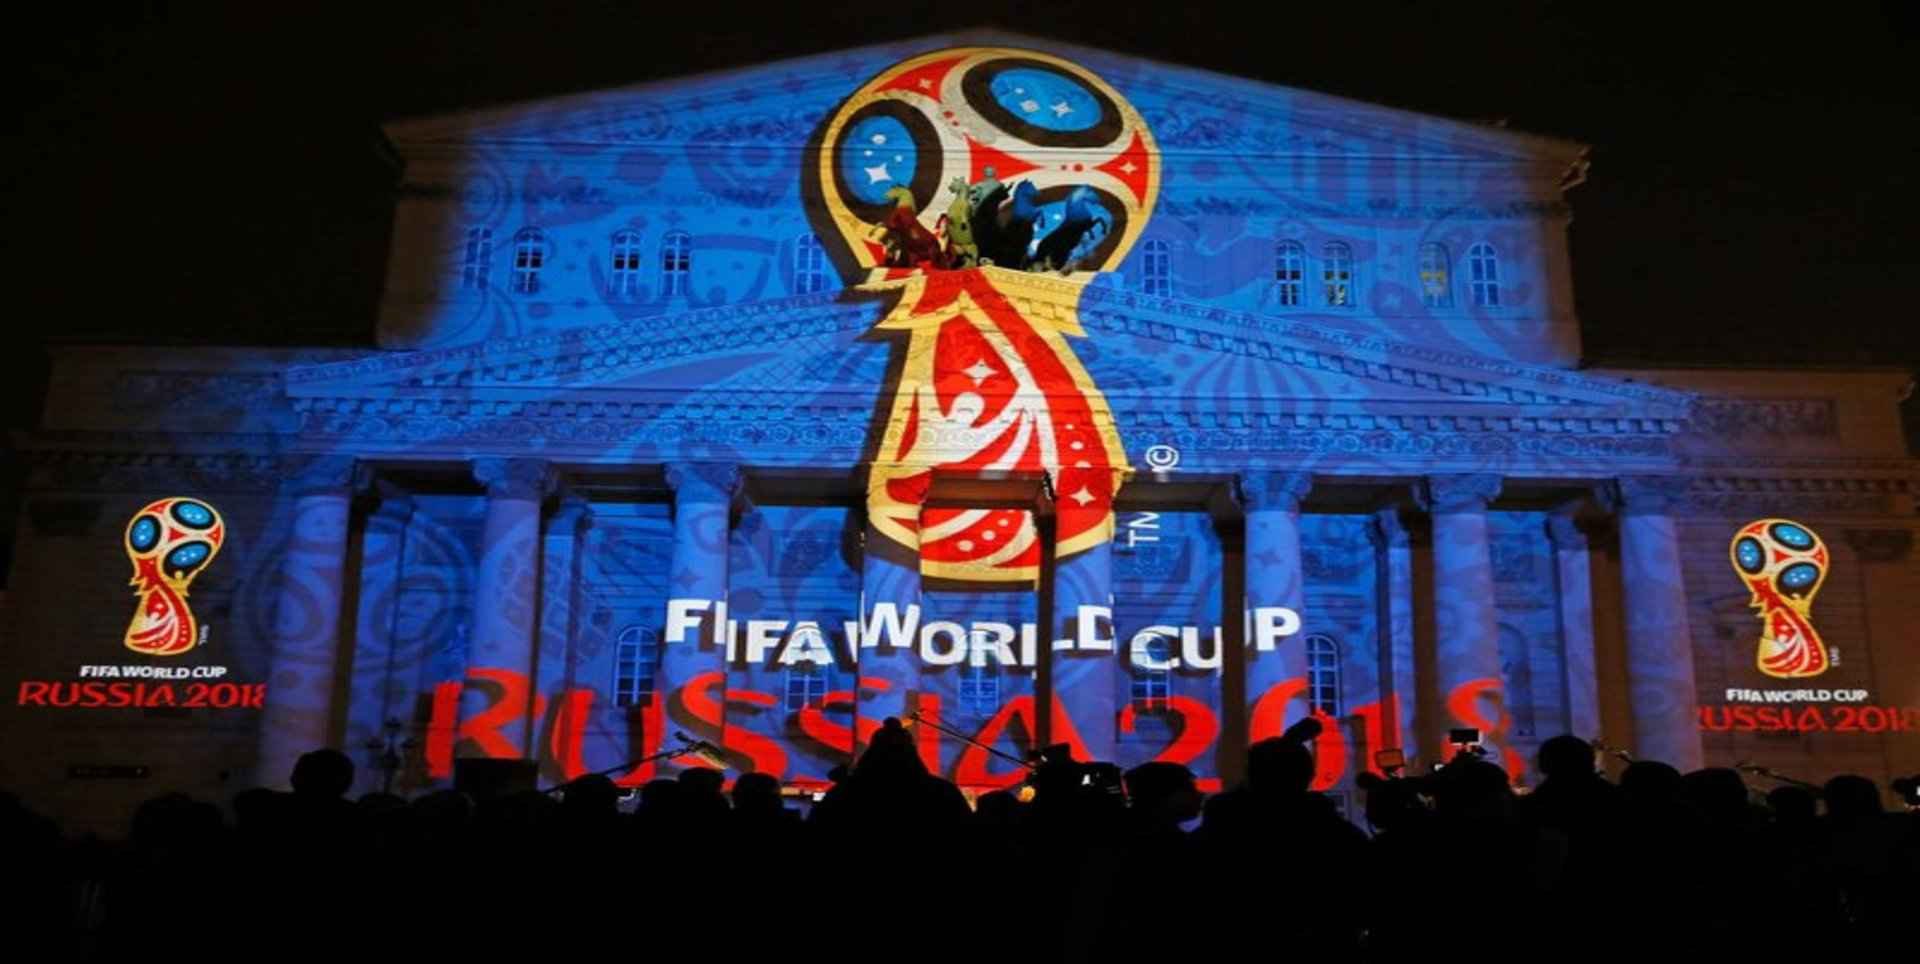 FIFA WC Czech Republic V Germany Live